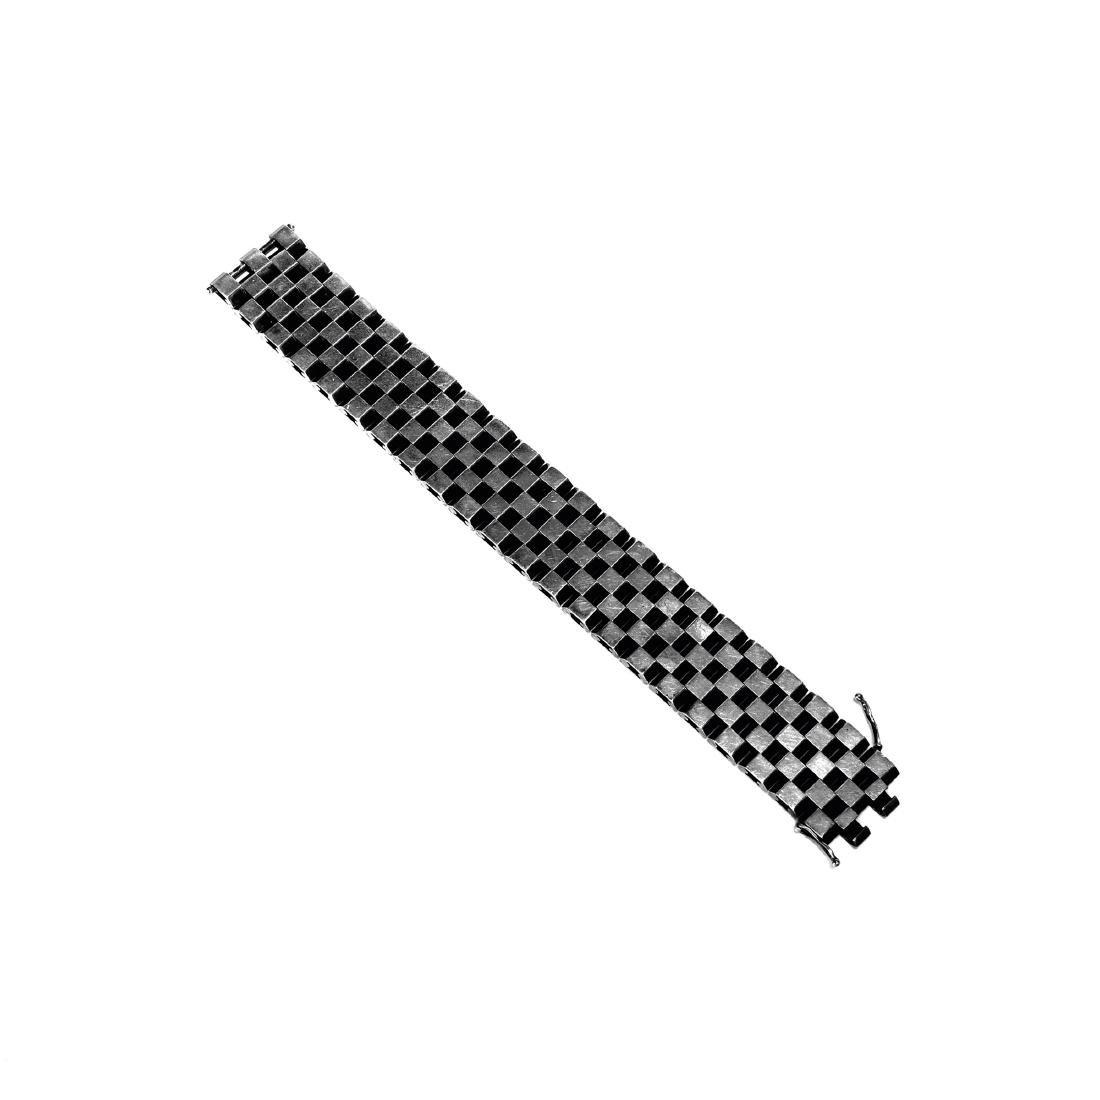 Bracelet, c1950